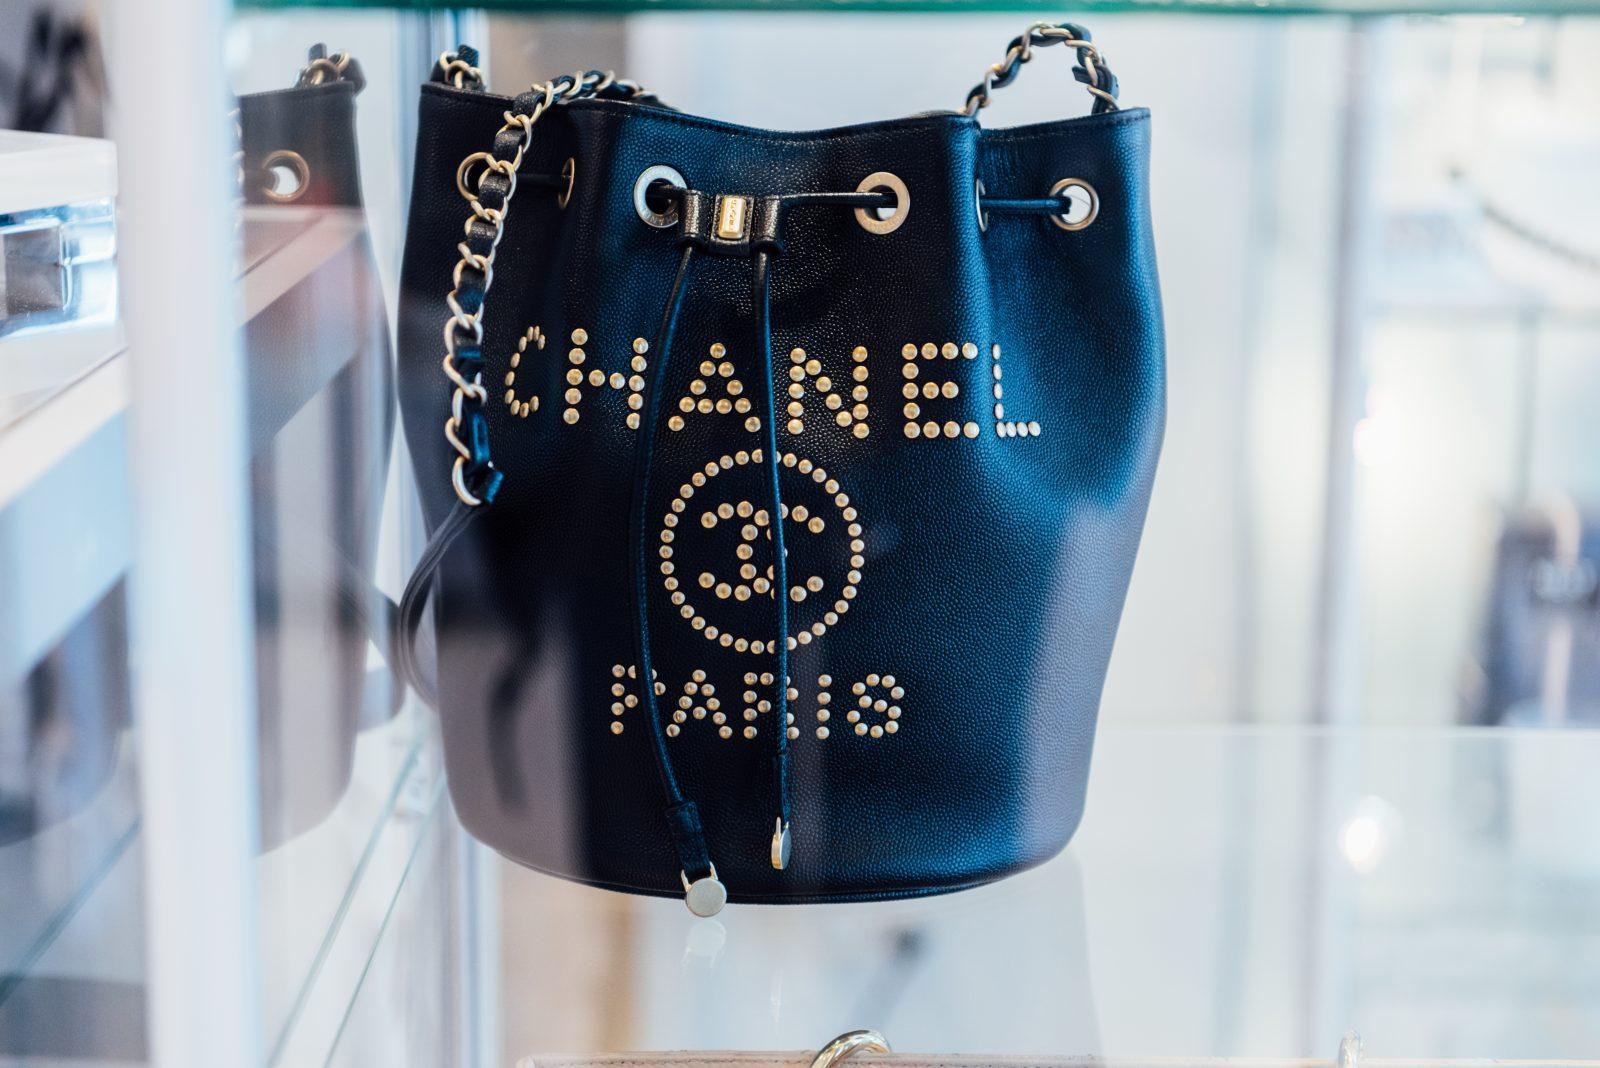 Chanel Paris drawstring vintage bag from Gus Mayer